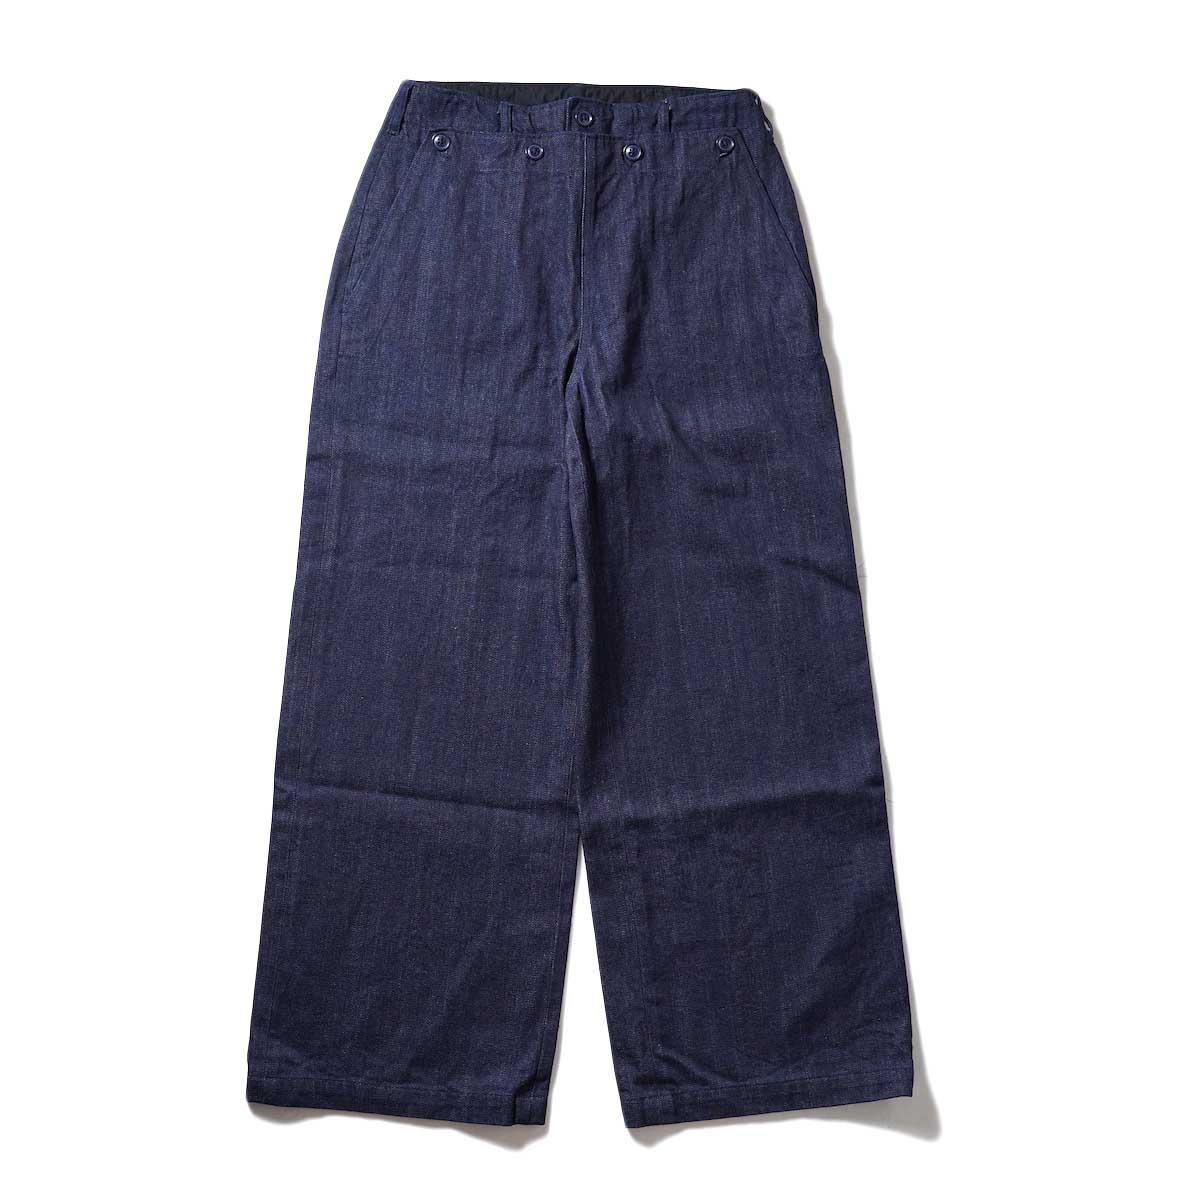 ENGINEERED GARMENTS / Sailor Pant (Indigo) 正面